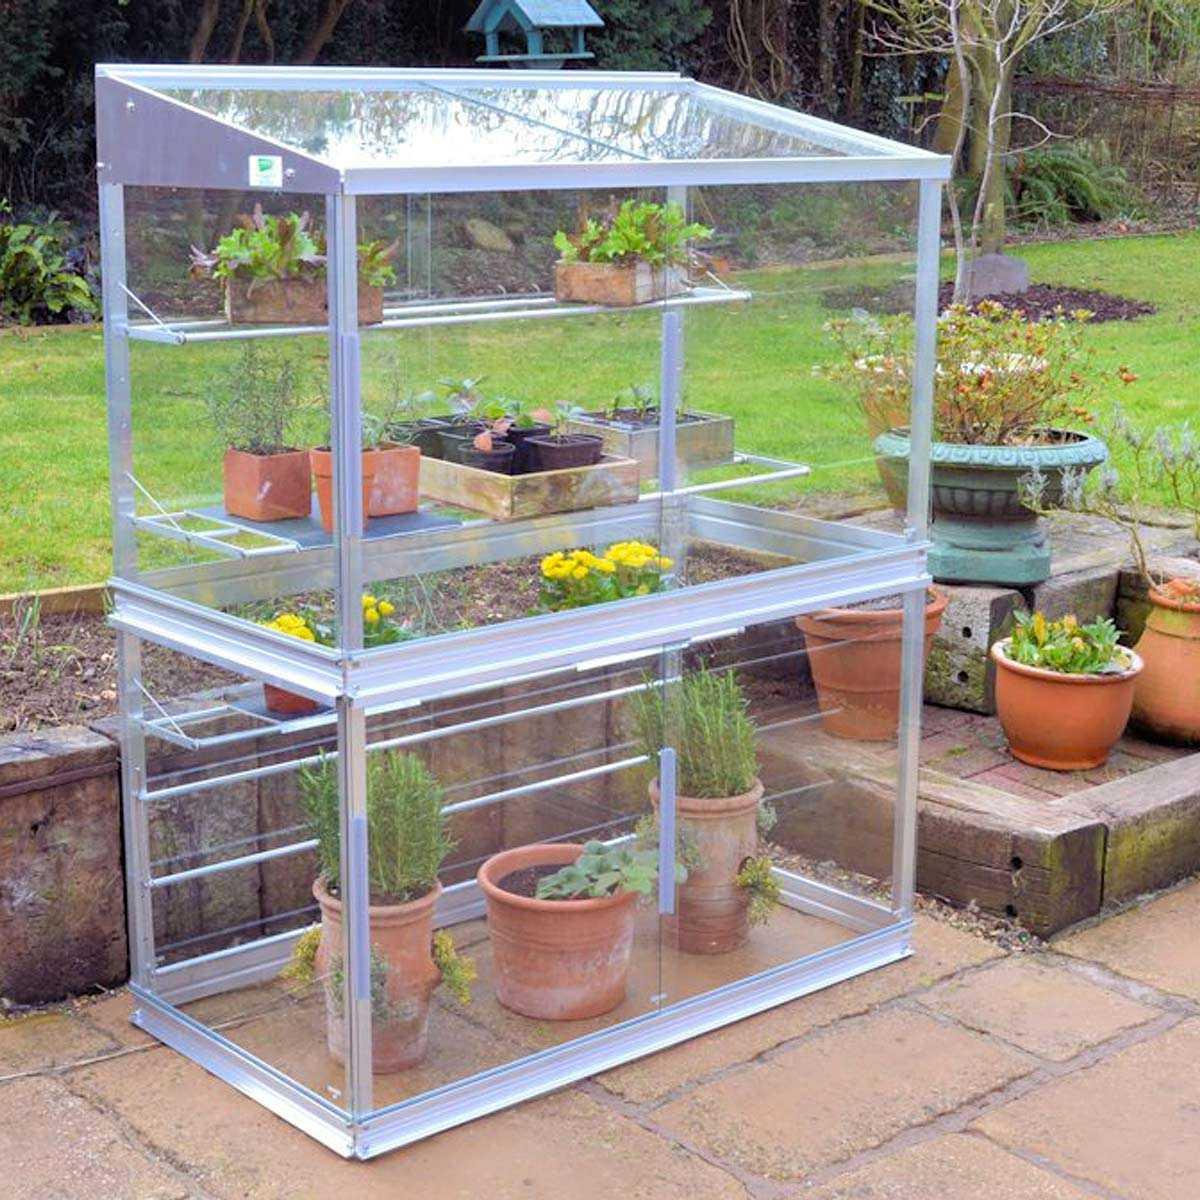 Mini Serre De Jardin En Verre Et Aluminium H.150Cm pour Petite Serres De Jardin